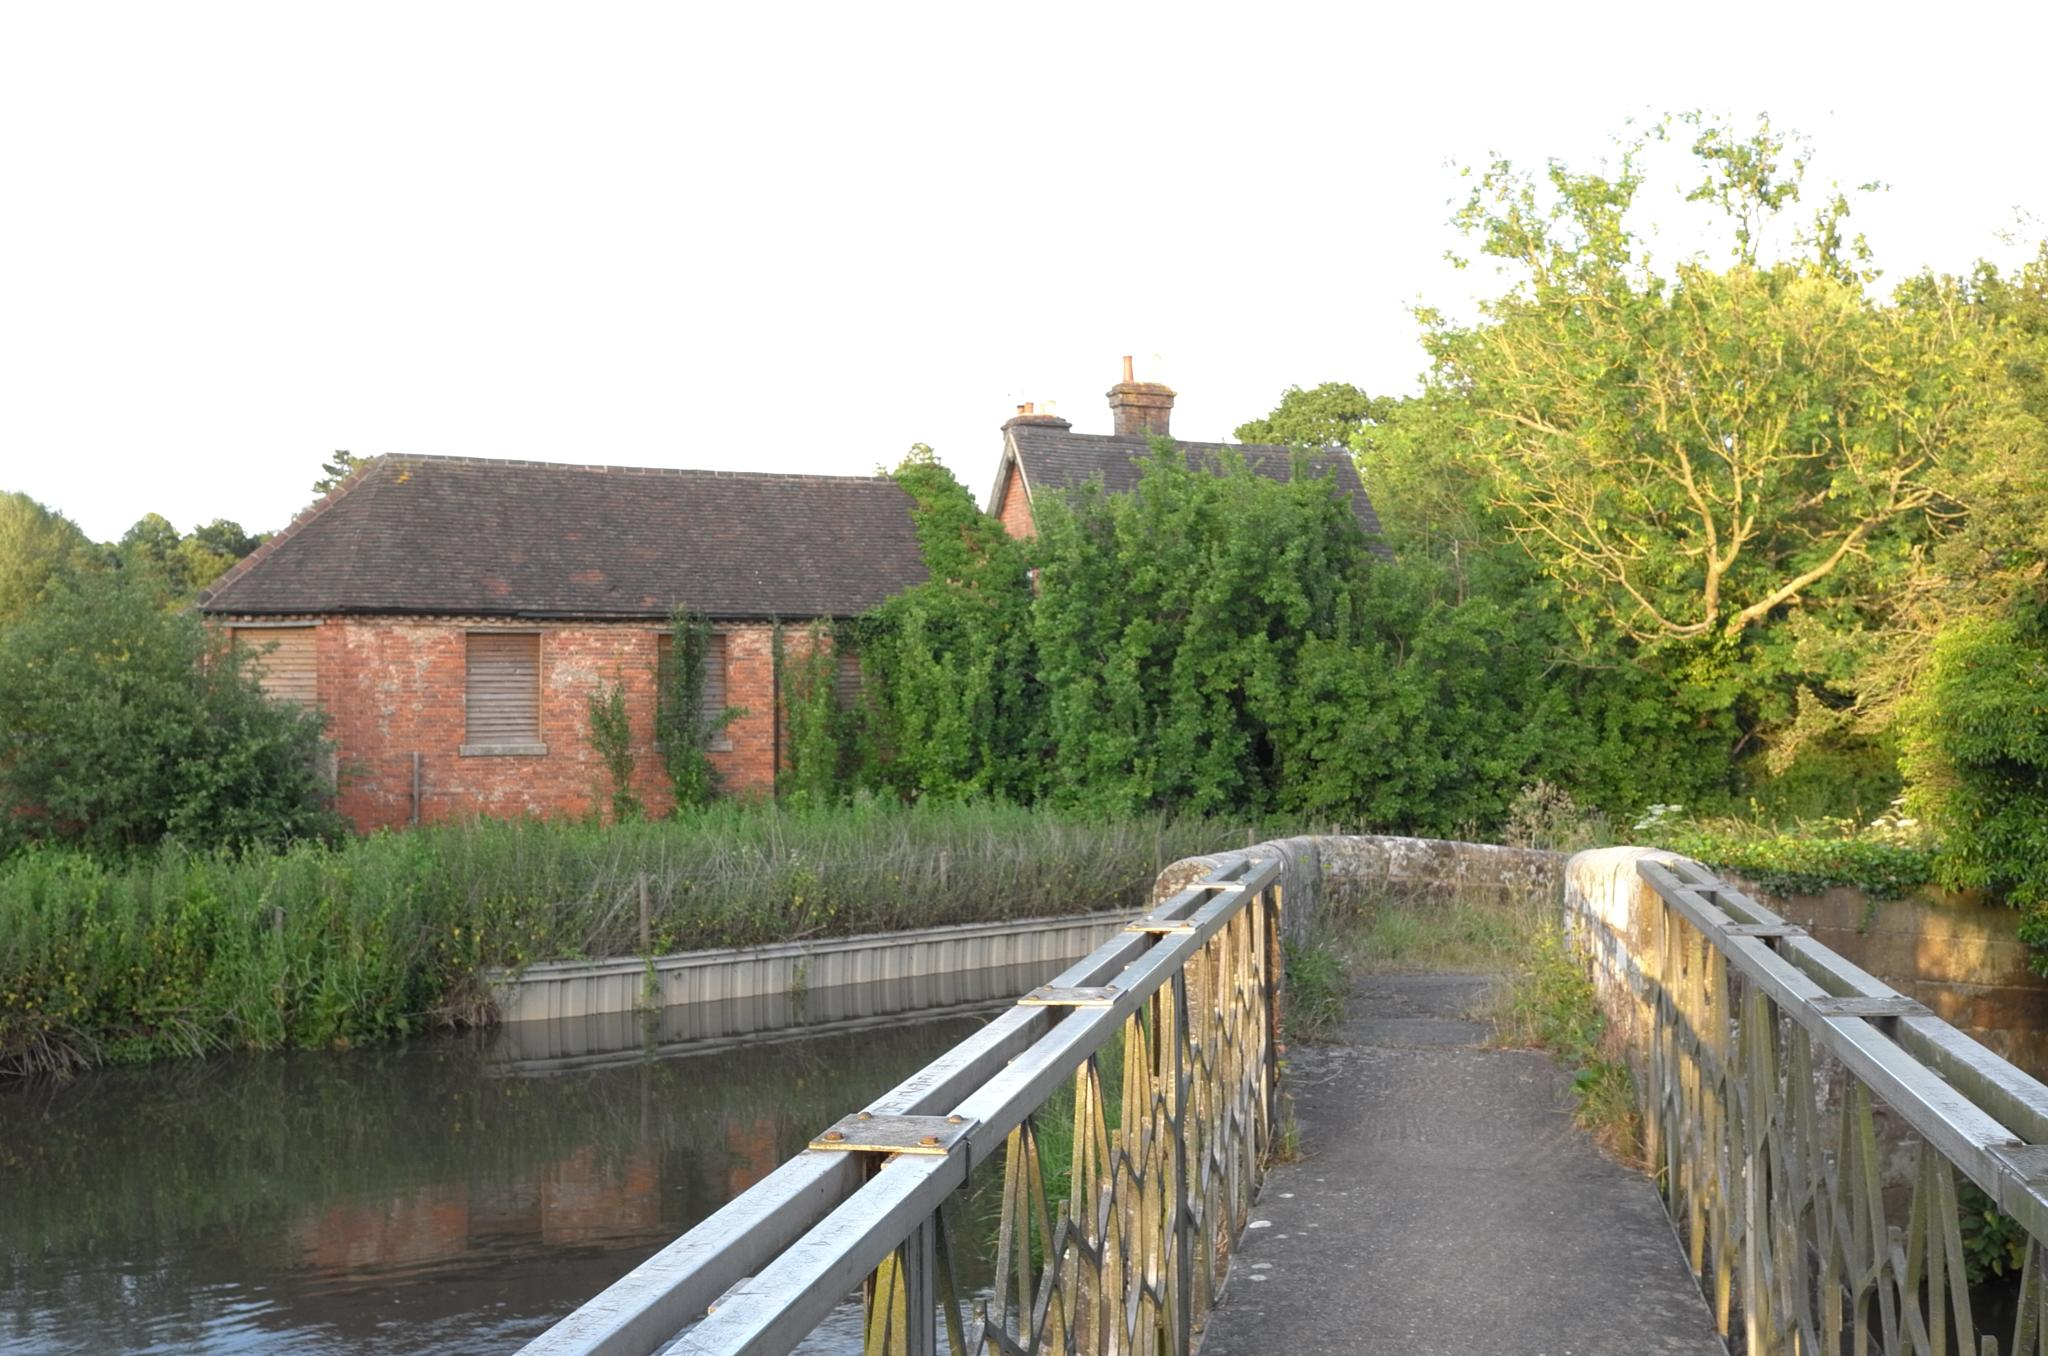 Bridge over the River Blythe at Little Packington by john.coates.792